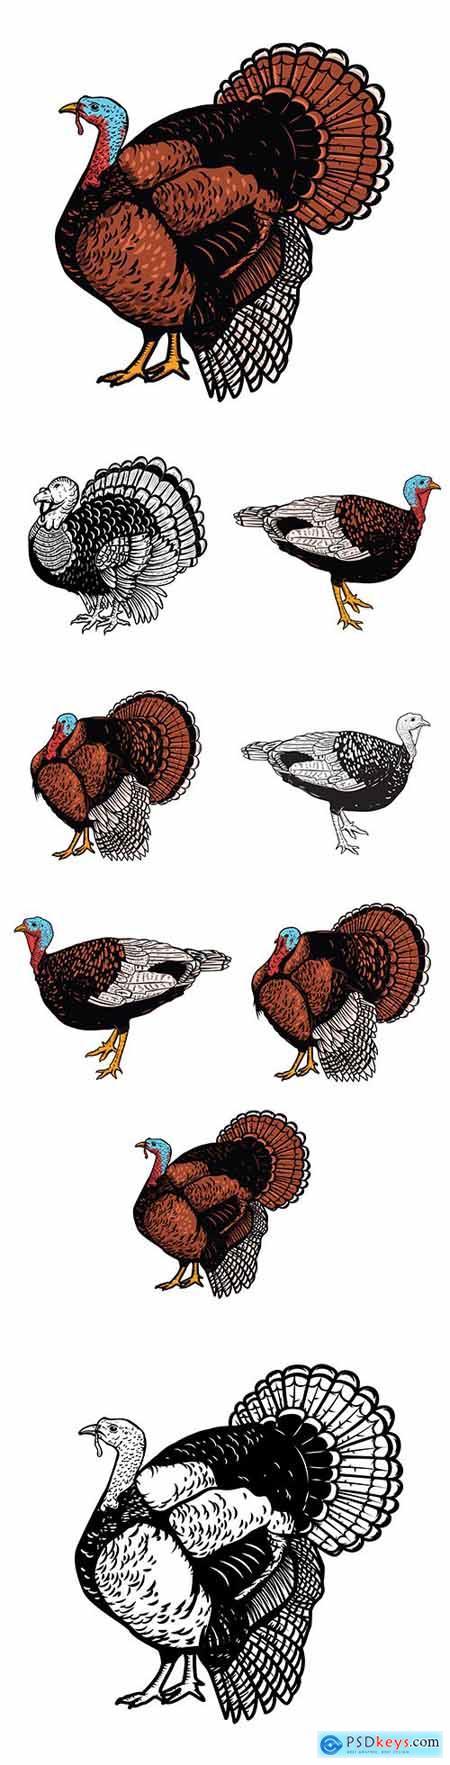 Thanksgiving illustration turkey on white background illustration